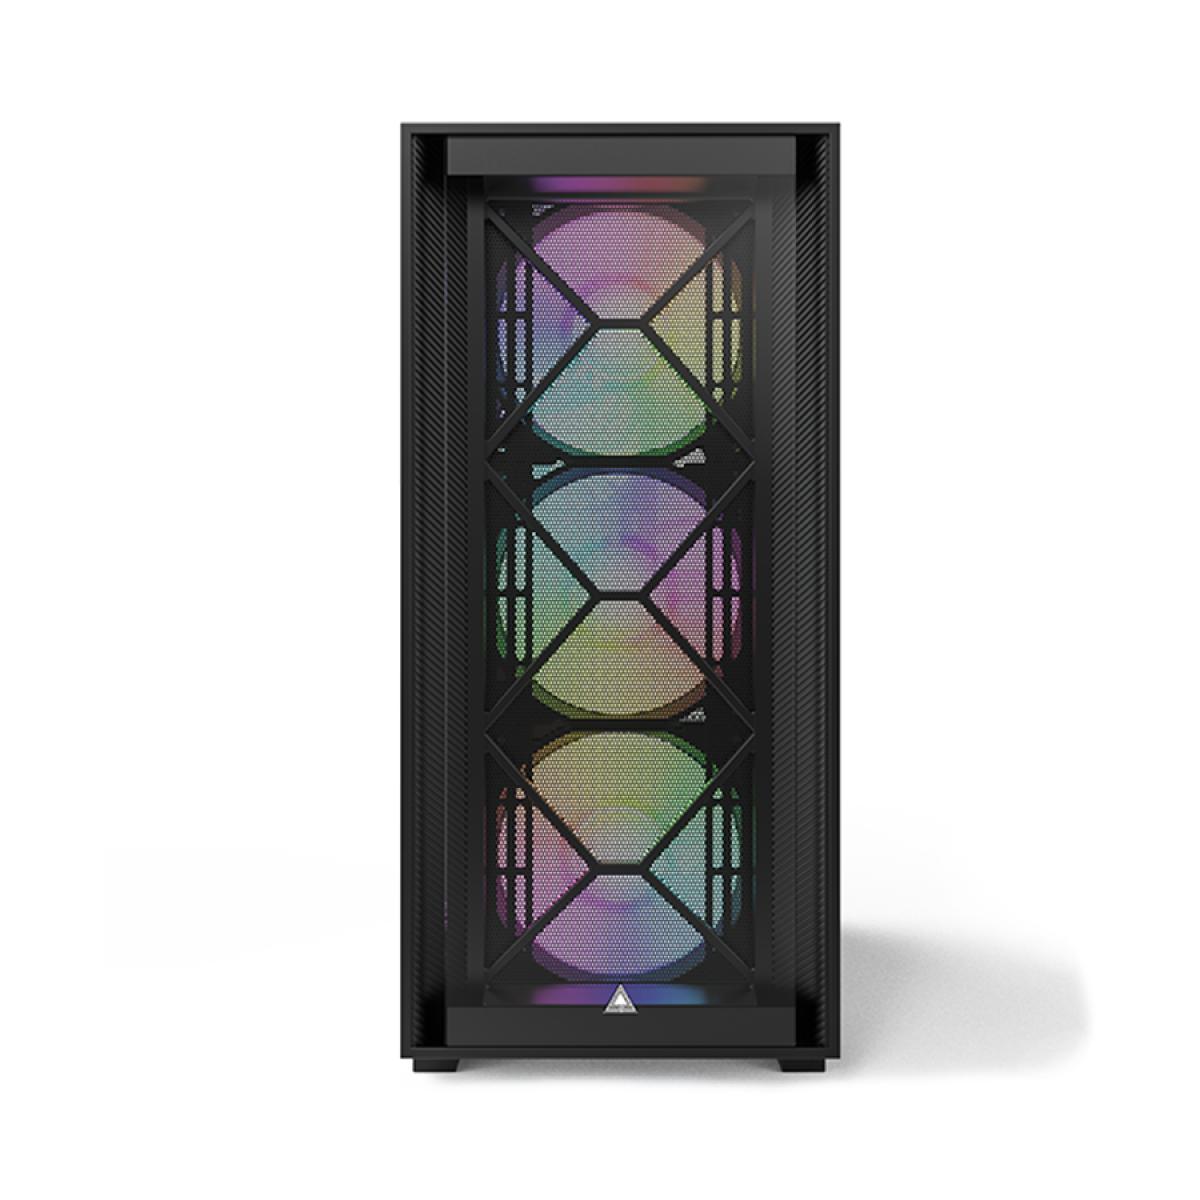 Gabinete Gamer Montech Air 1000 PREMIUM, Mid Tower, RGB, Vidro Temperado, Black, ATX, Sem Fonte, Com 4 Fans